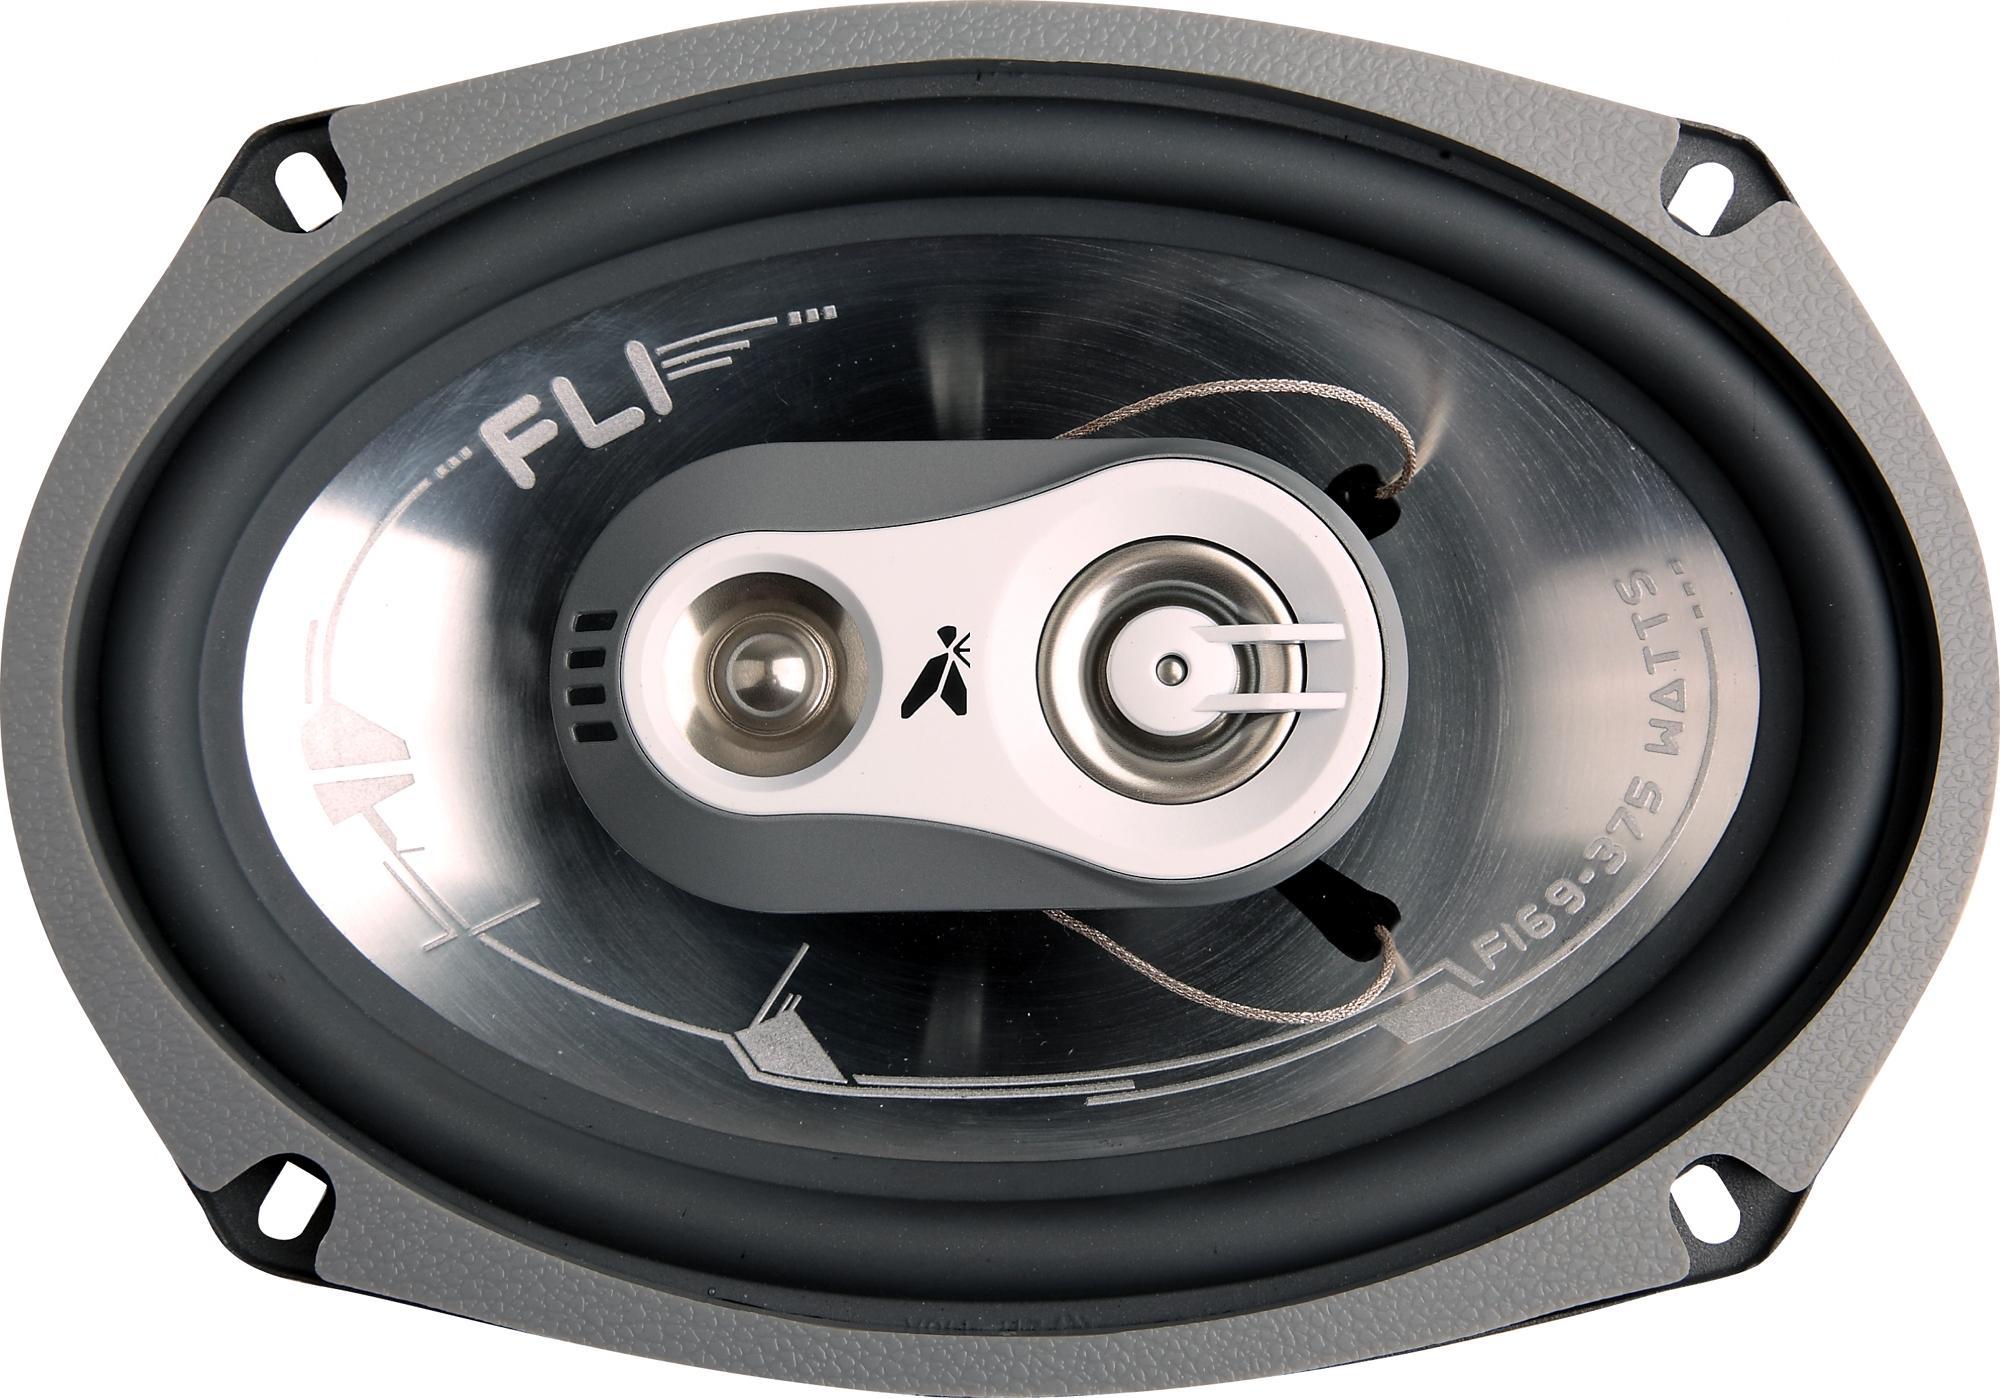 speakers car. fli fi69 6x9\u0026#034; 3 way coaxial car speakers